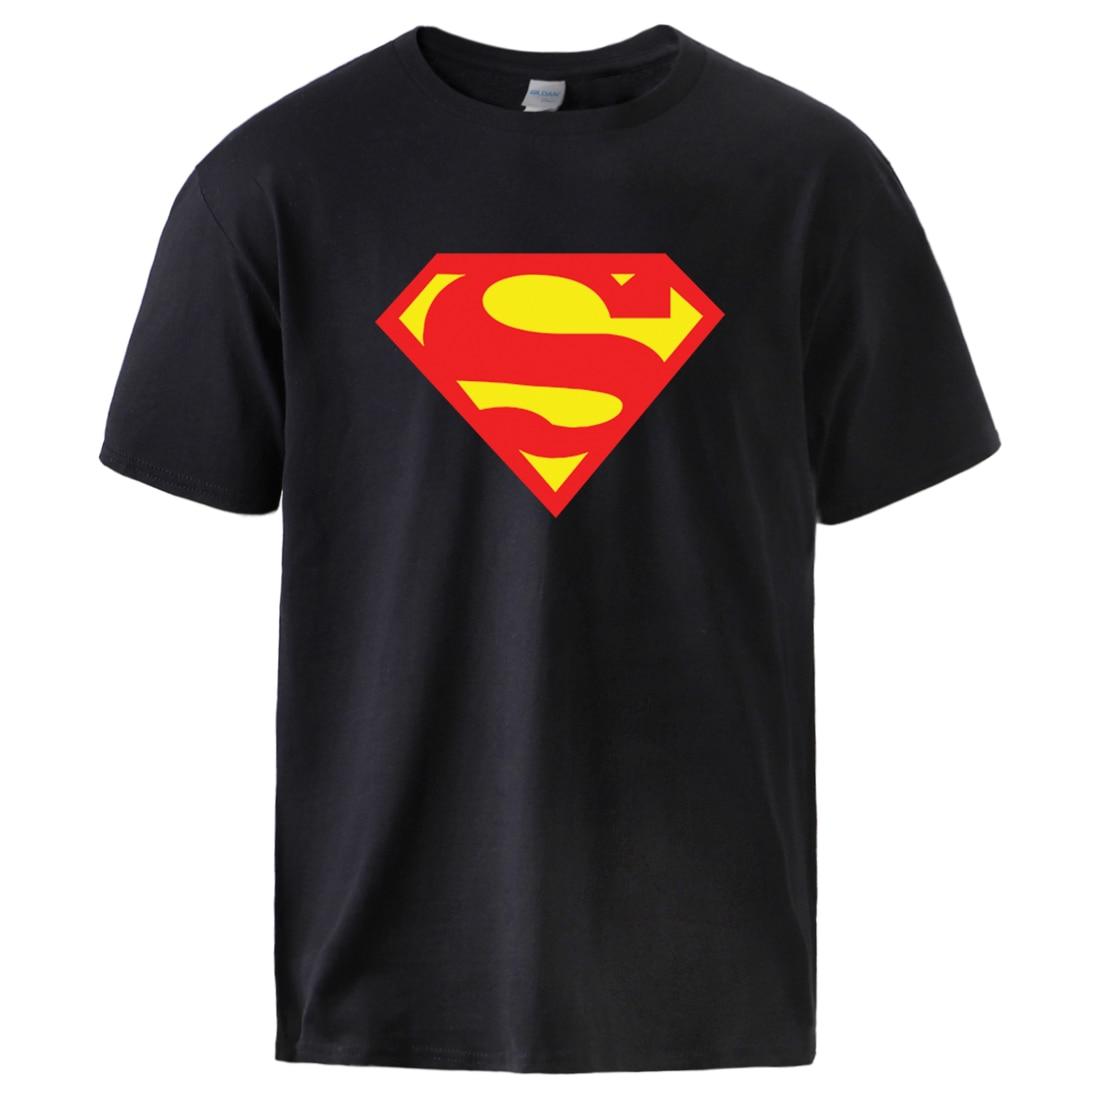 Superman Clark Kent T Shirts Mens Casual Cotton Sportswear Summer Short Sleeve Tops Man New Brand Fashion Streetwear T Shirts